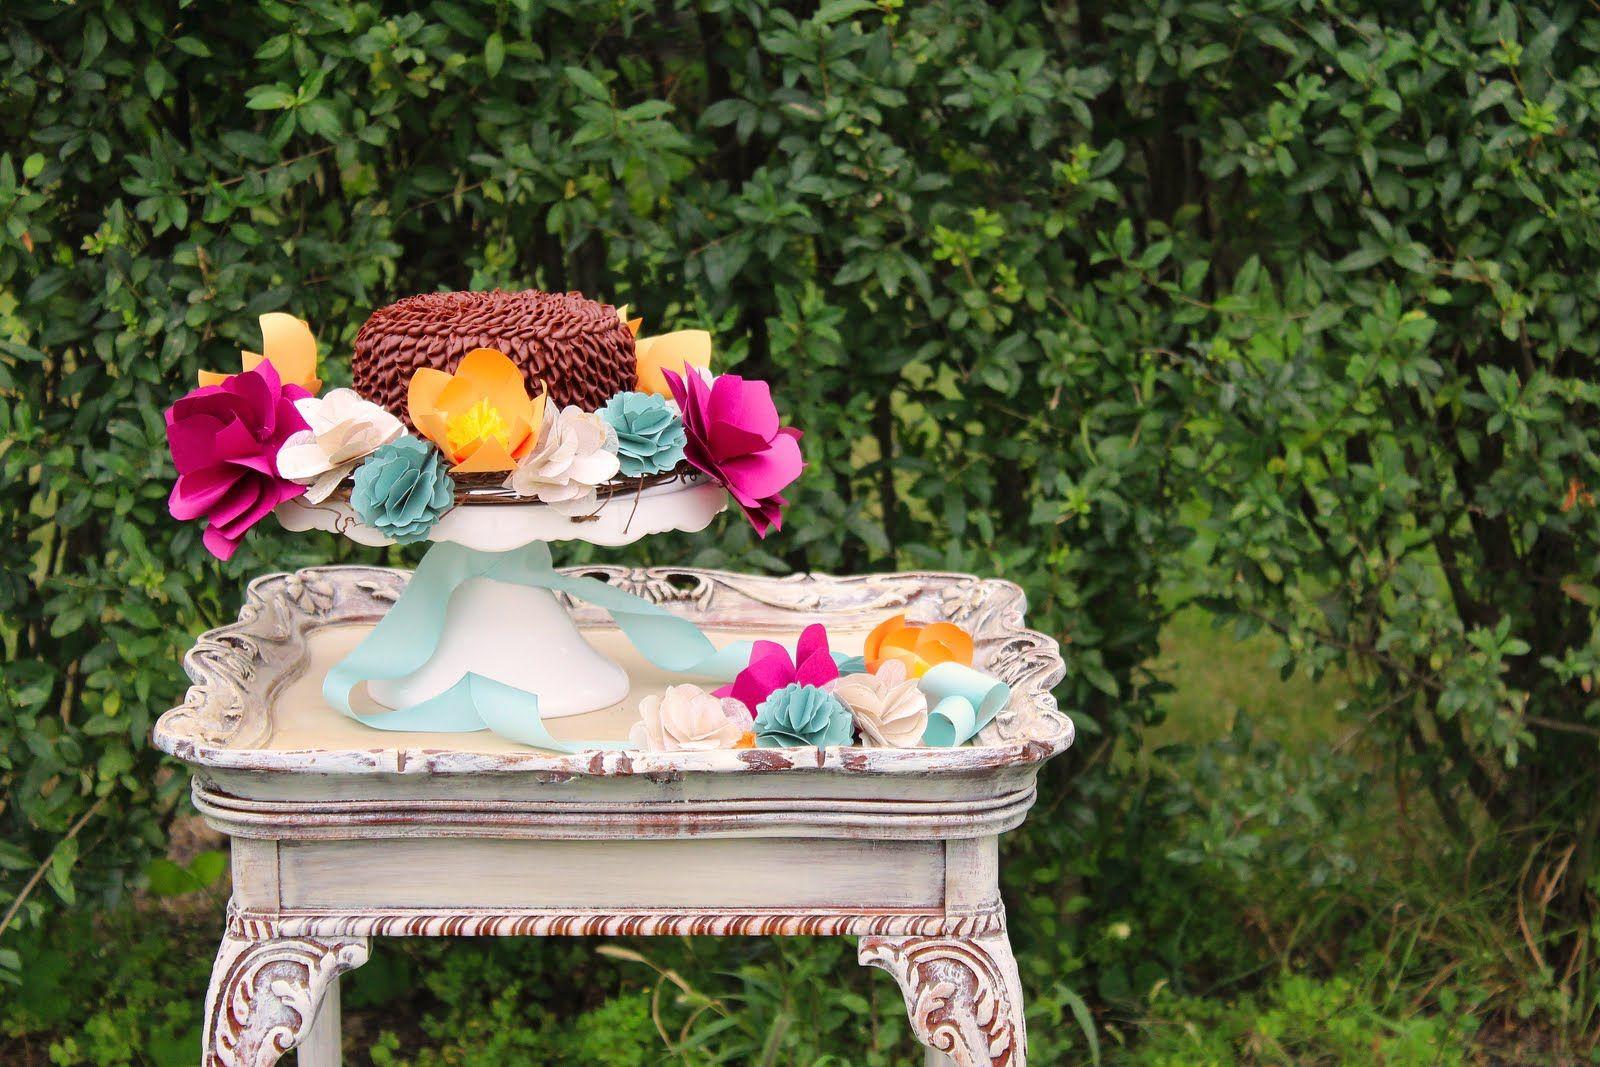 DIY Paper Flower Cake Wreaths